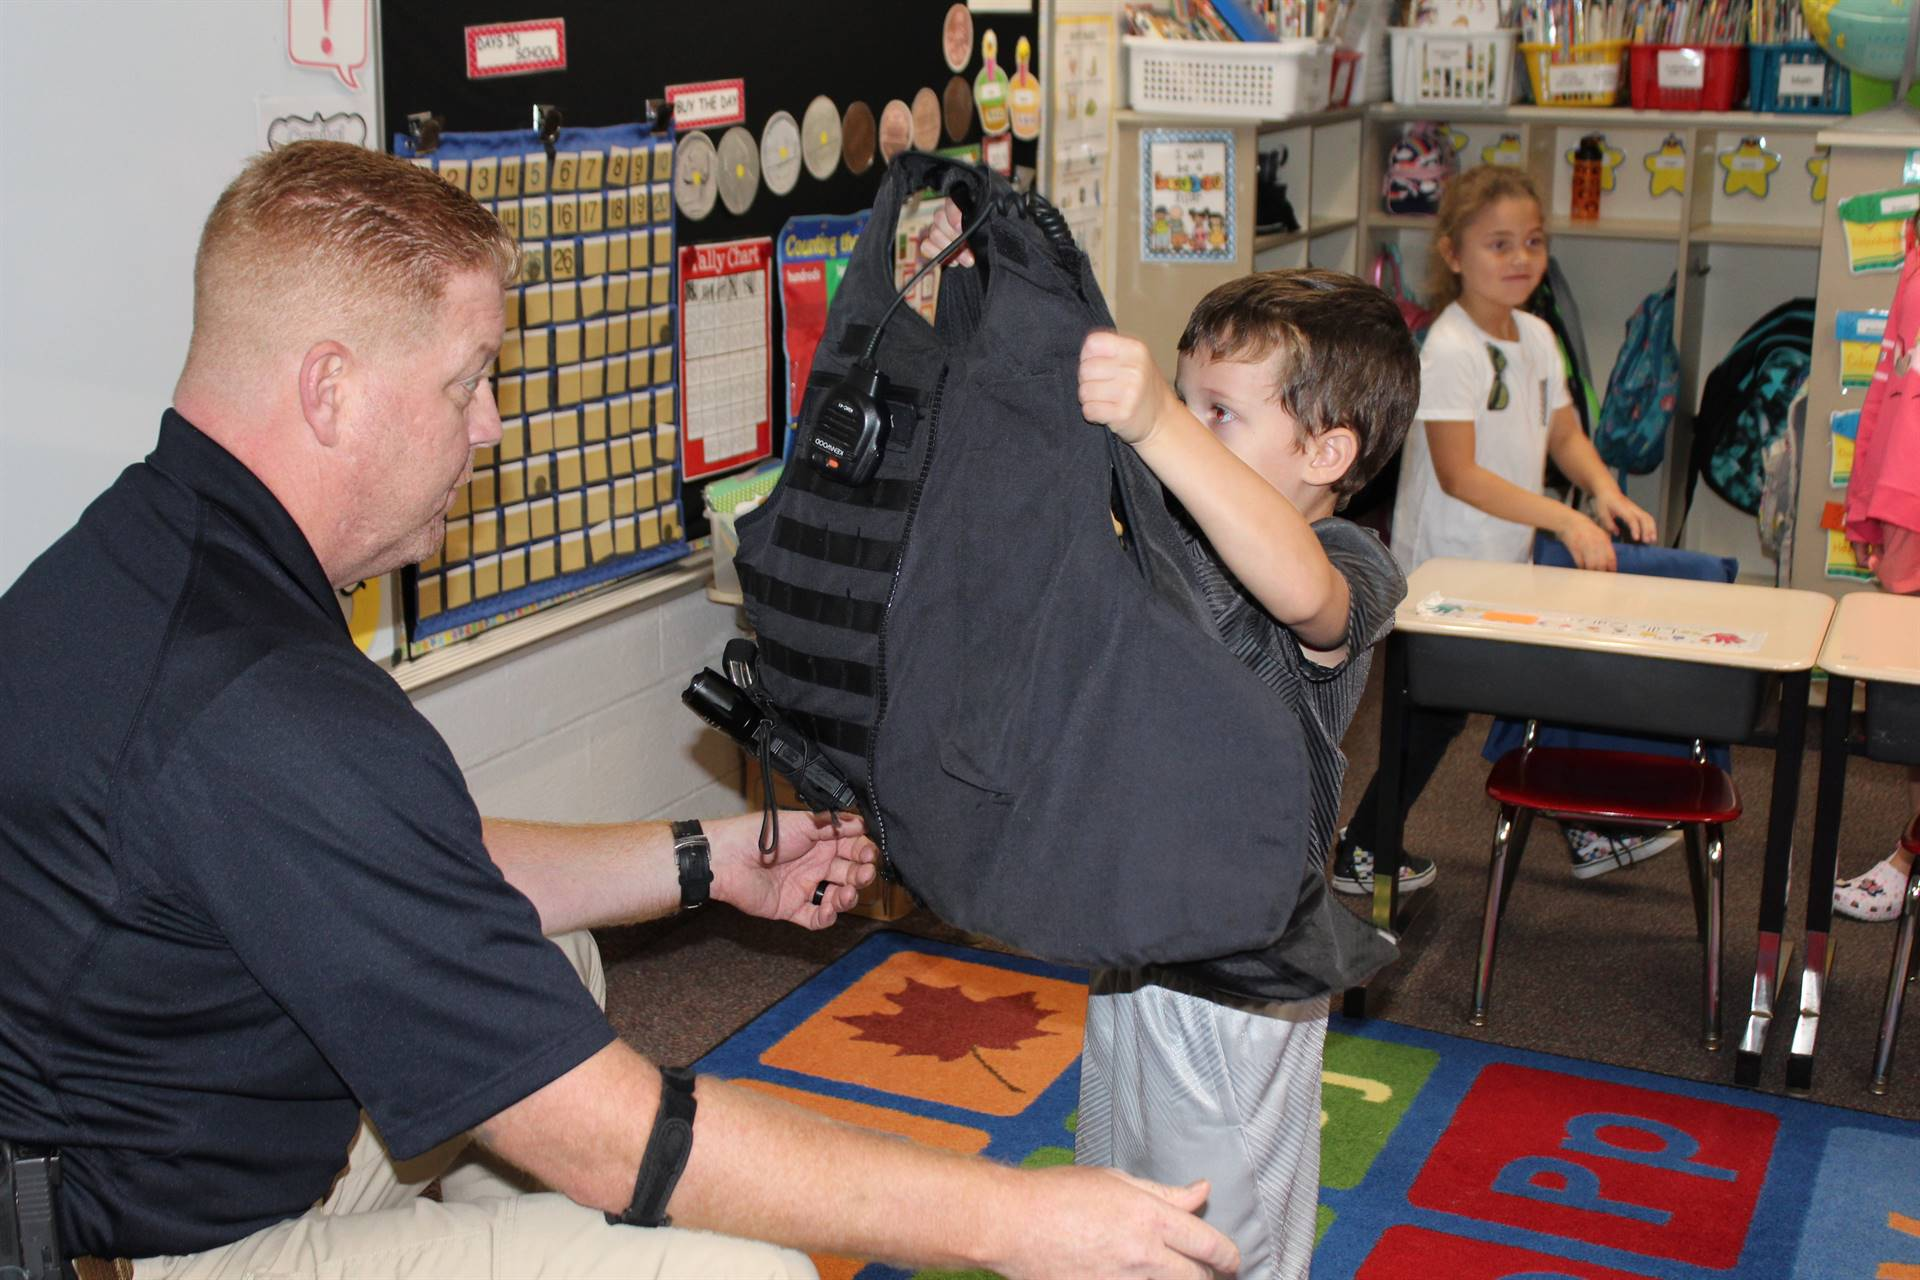 Student holding Officer Ken's bullet proof vest